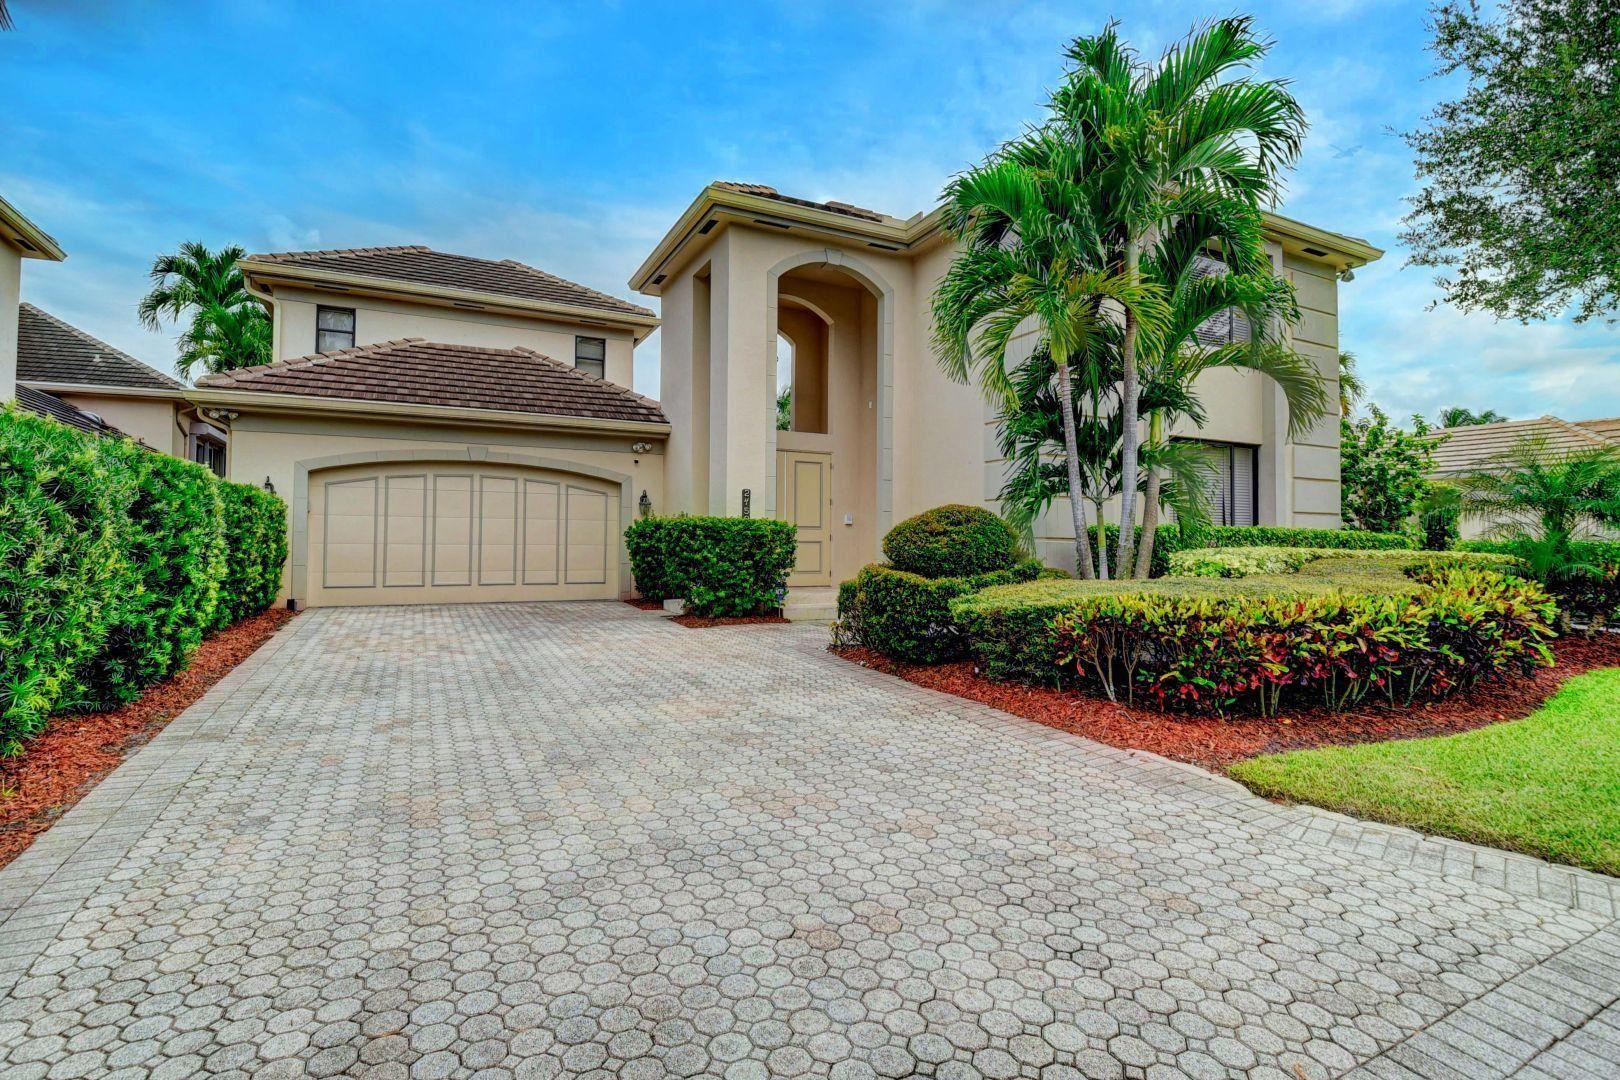 2452 NW 62nd Street, Boca Raton, FL 33496 - #: RX-10631462